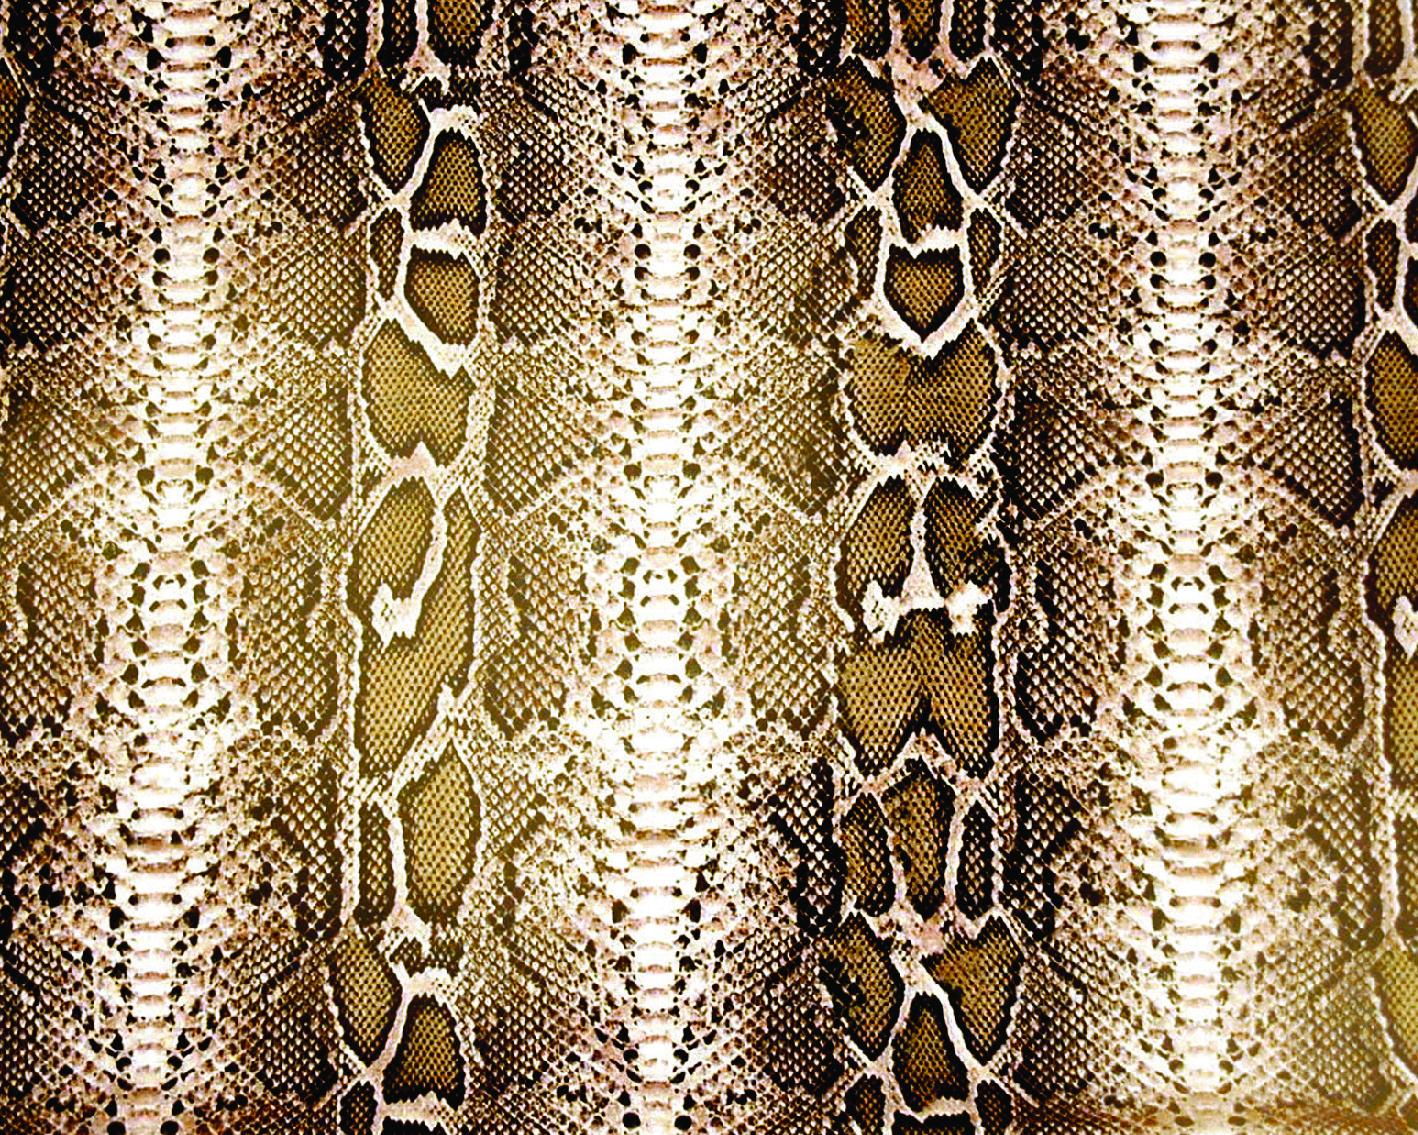 snake skins-18